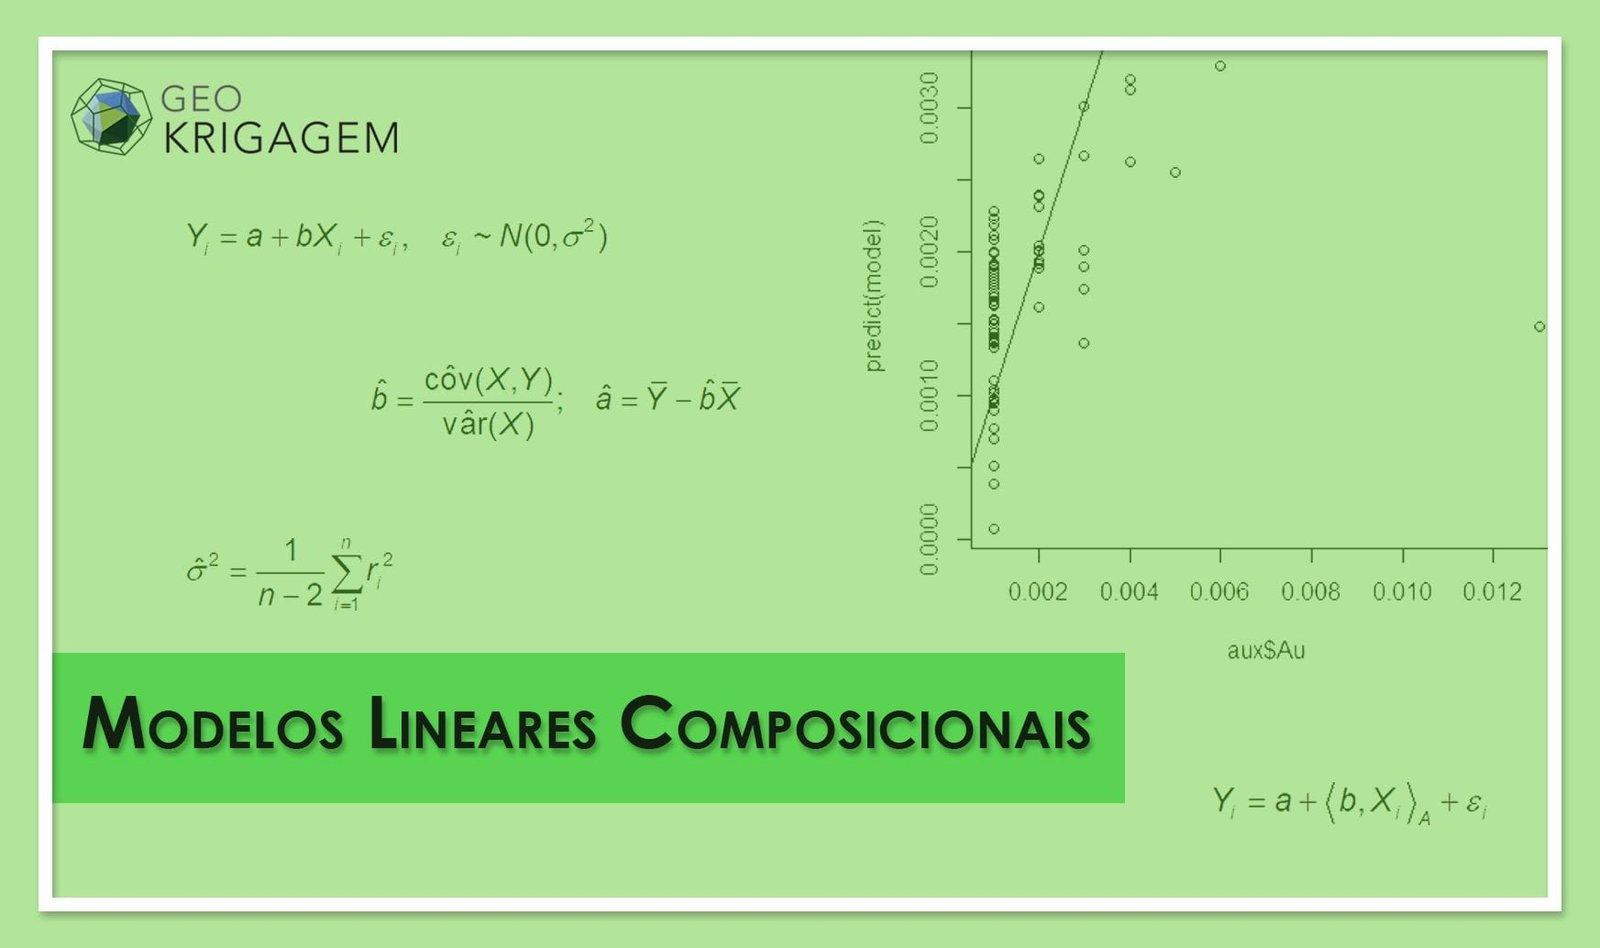 Análise composicional - modelos lineares composicionais